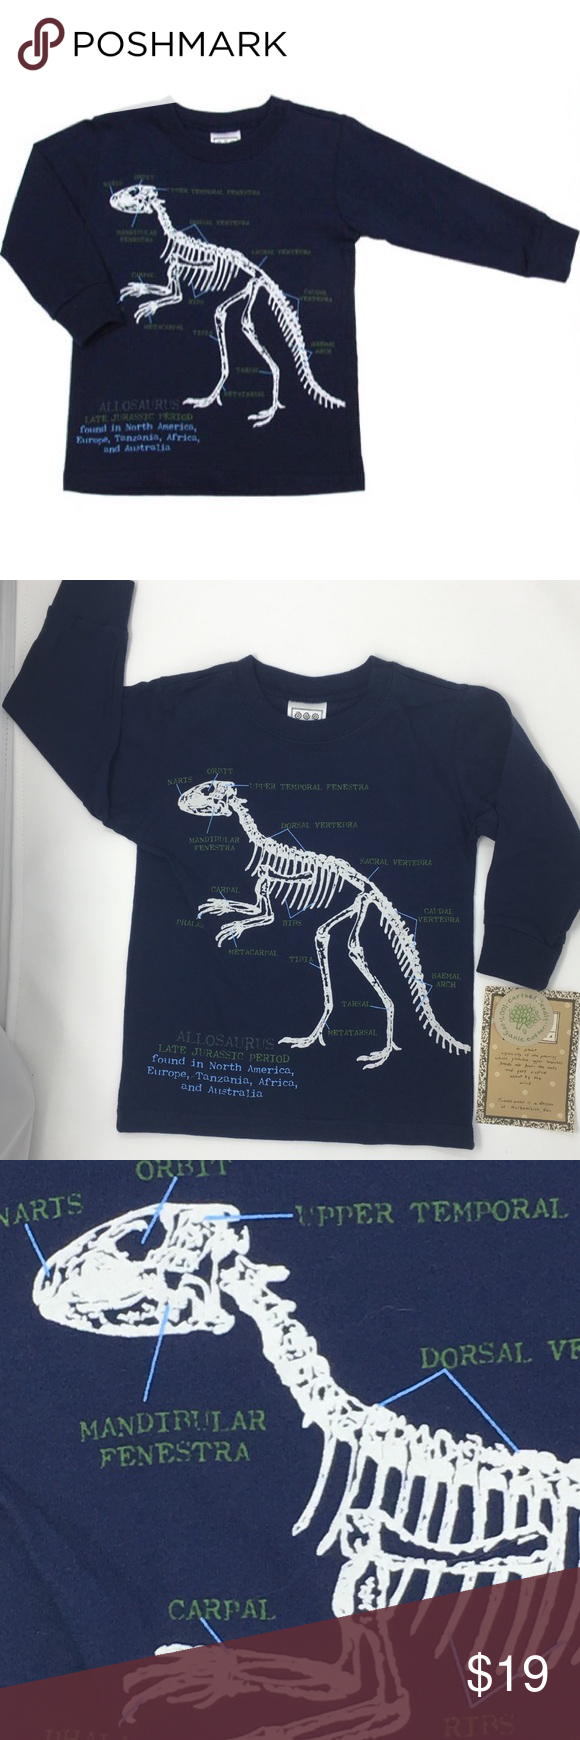 daf7e4d3d Mulberribush Boys Navy Dinosaur Fossil Tee Shirt T Mulberribush Shirts &  Tops Tees - Long Sleeve